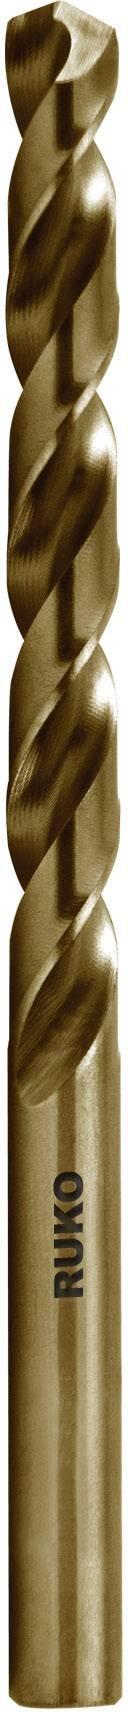 Stück 1 HSS-E DIN 338 Edelstahlbohrer Co 5/% Ø 5,1 mm